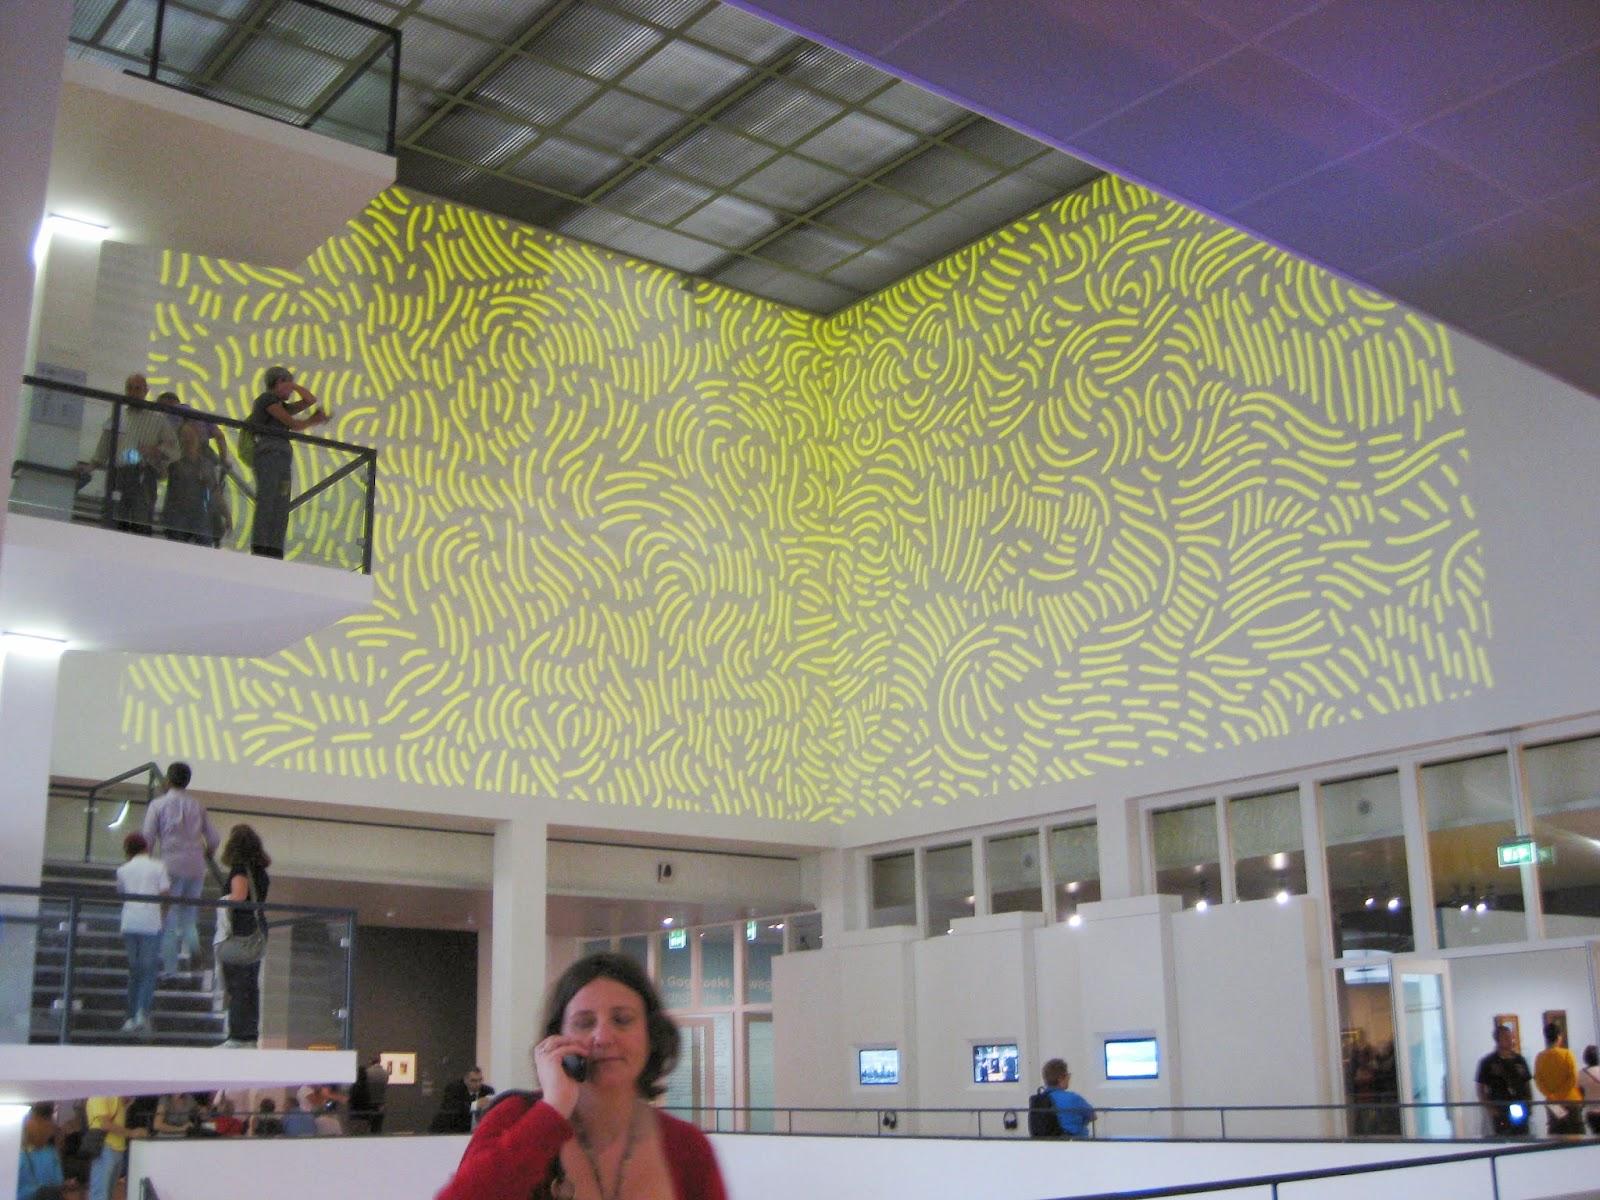 Van Gogh Museum atrium, Amsterdam. Photo by Karen Muntean.